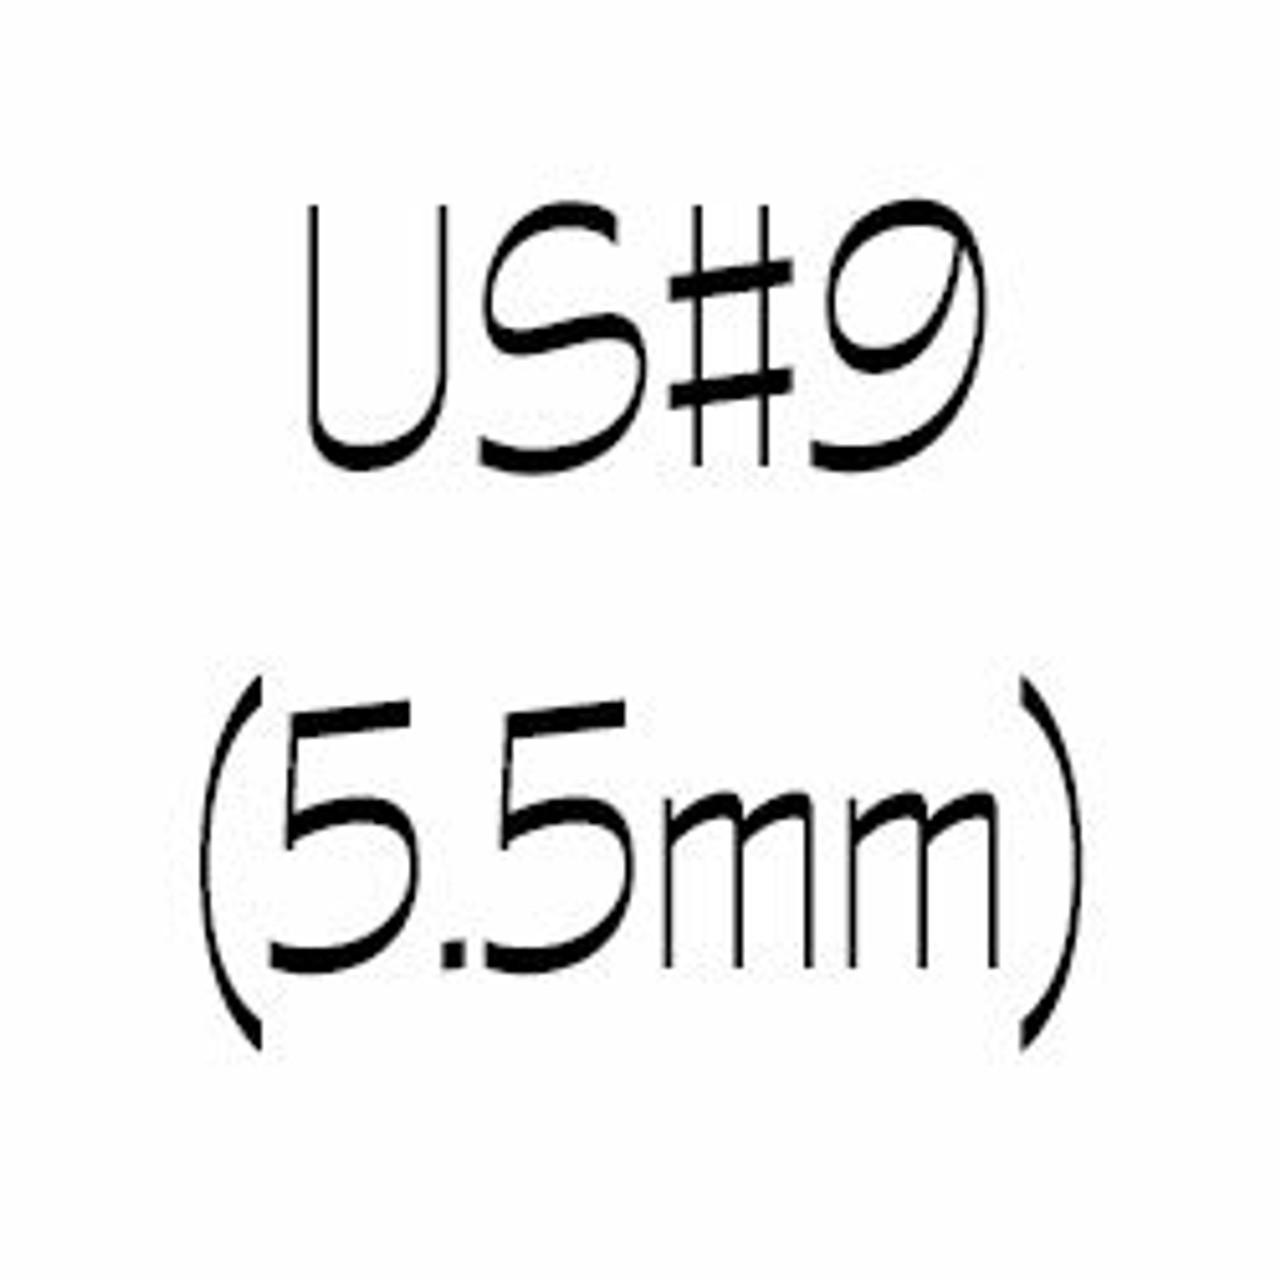 US#9 (5.5mm) Single Point Knitting Needles